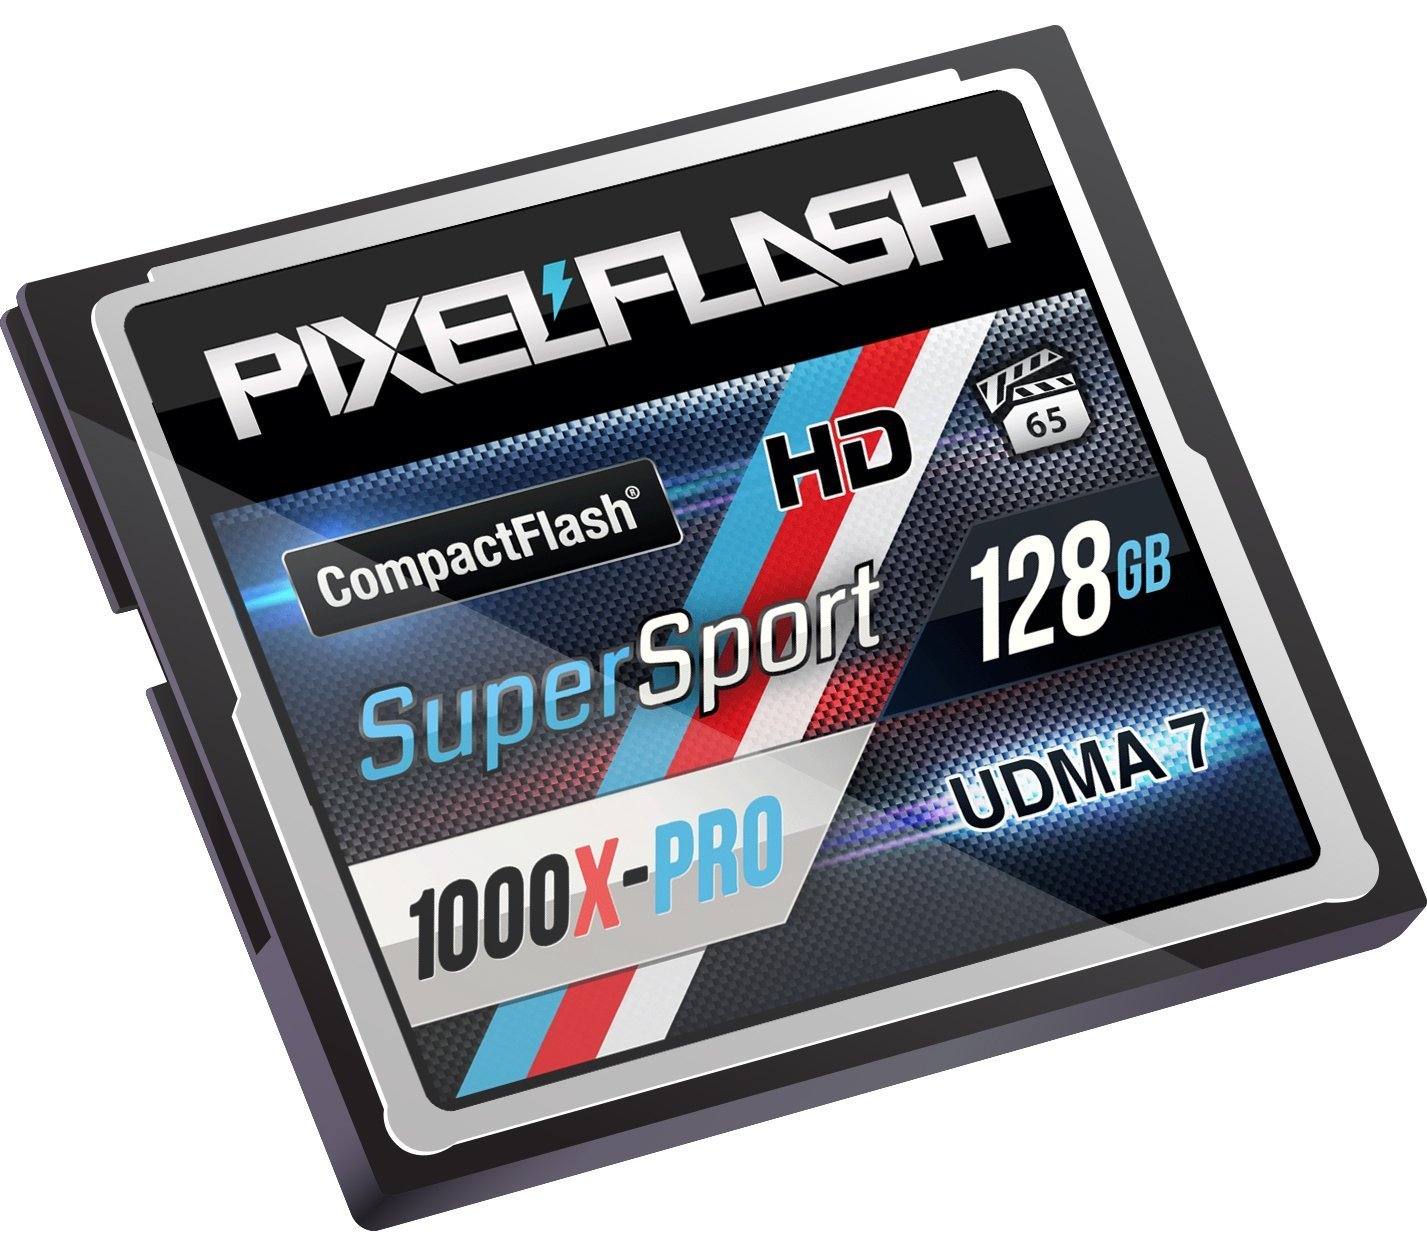 PixelFlash 128 GB 1106x Compact Flash Memory Card VPG-65 by PixelFlash (Image #2)